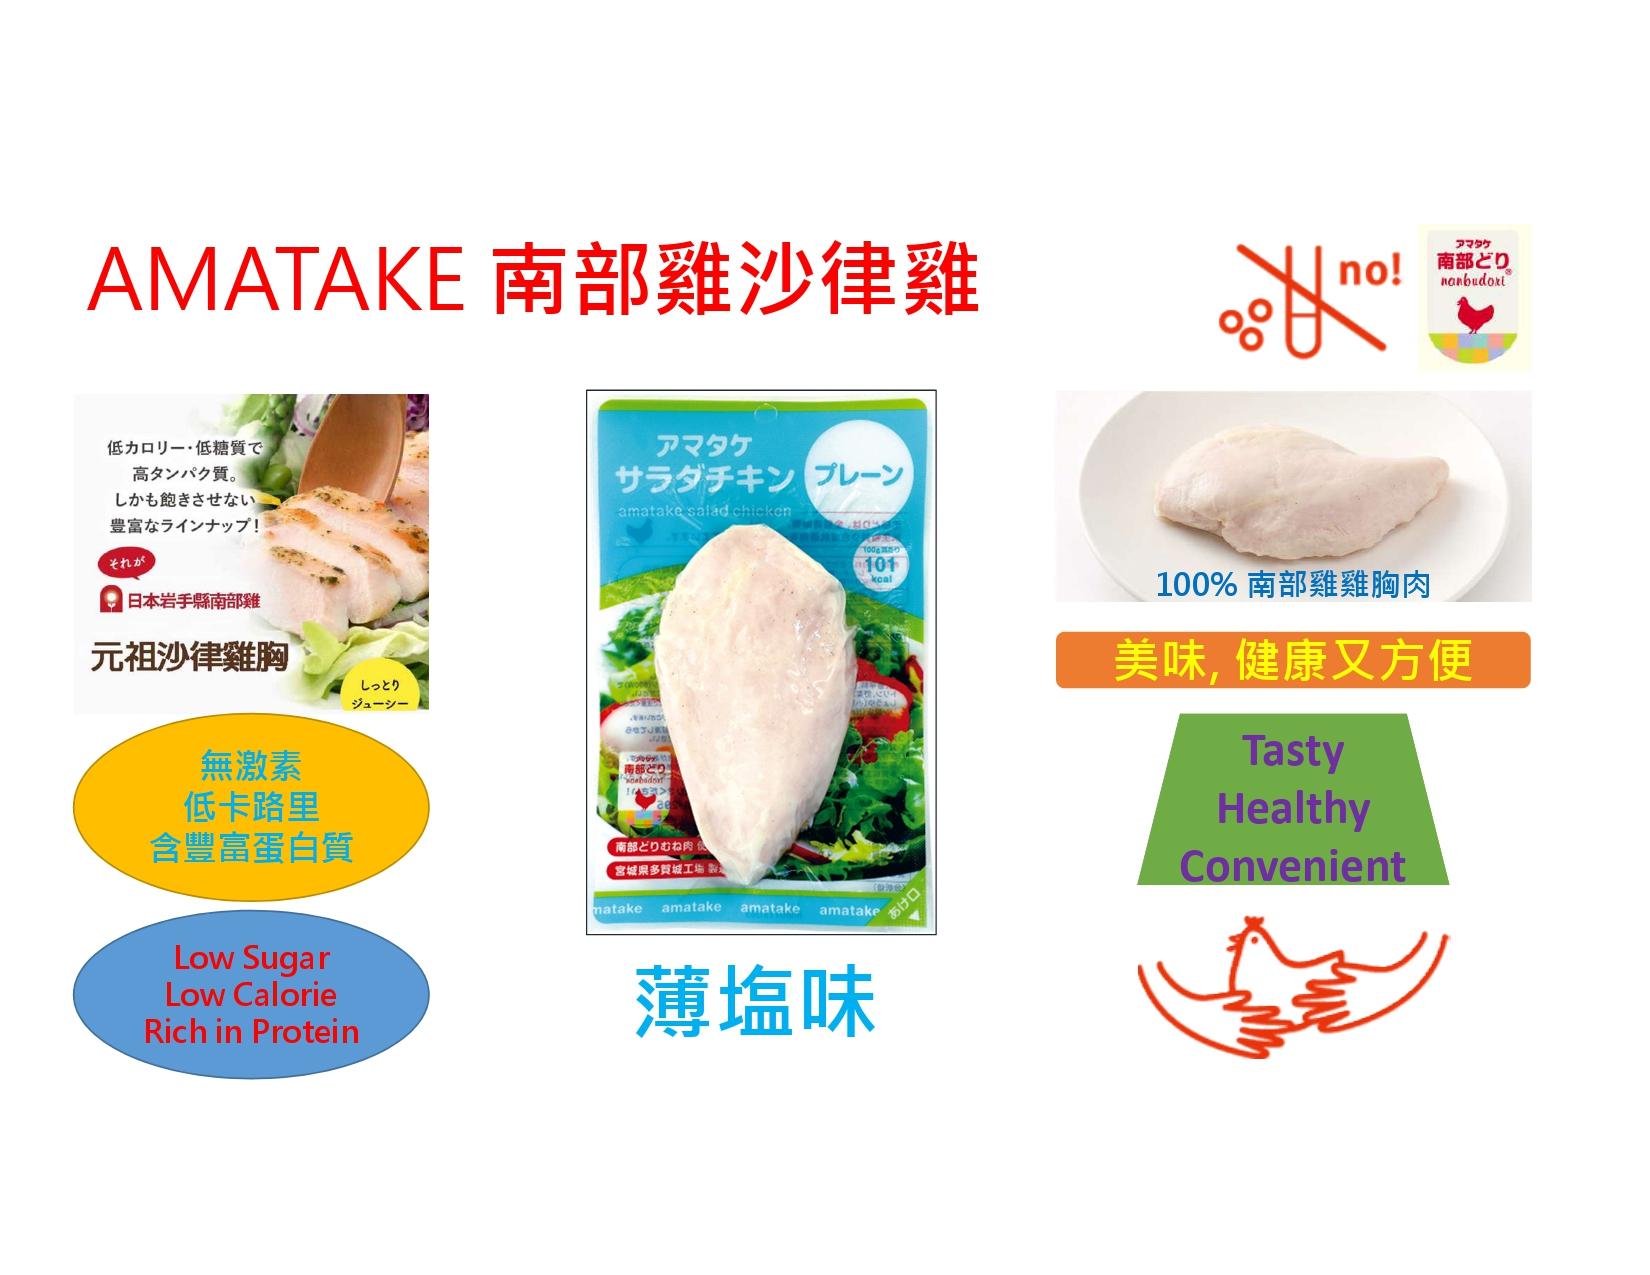 南部雞沙律雞 店鋪 CATALOG (29-08-20)_page-0003